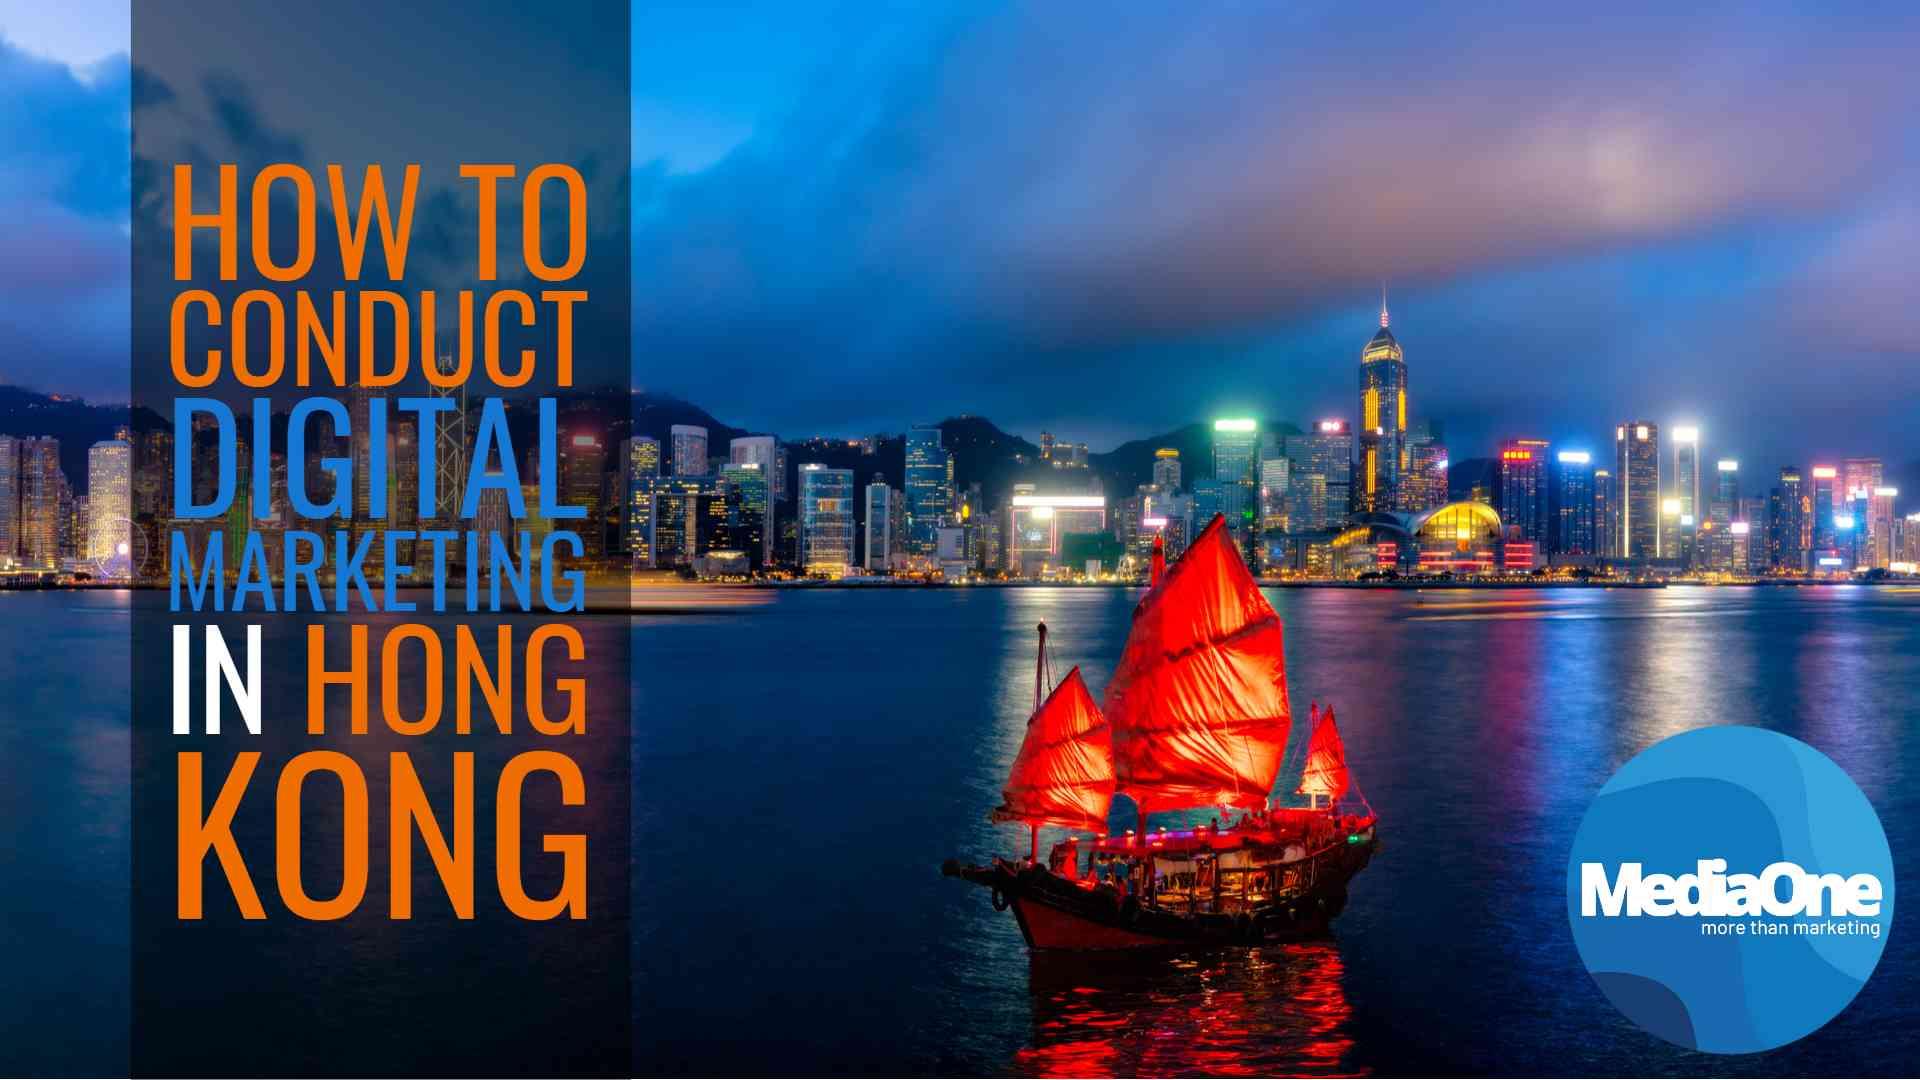 how-to-conduct-digital-marketing-in-hong-kong